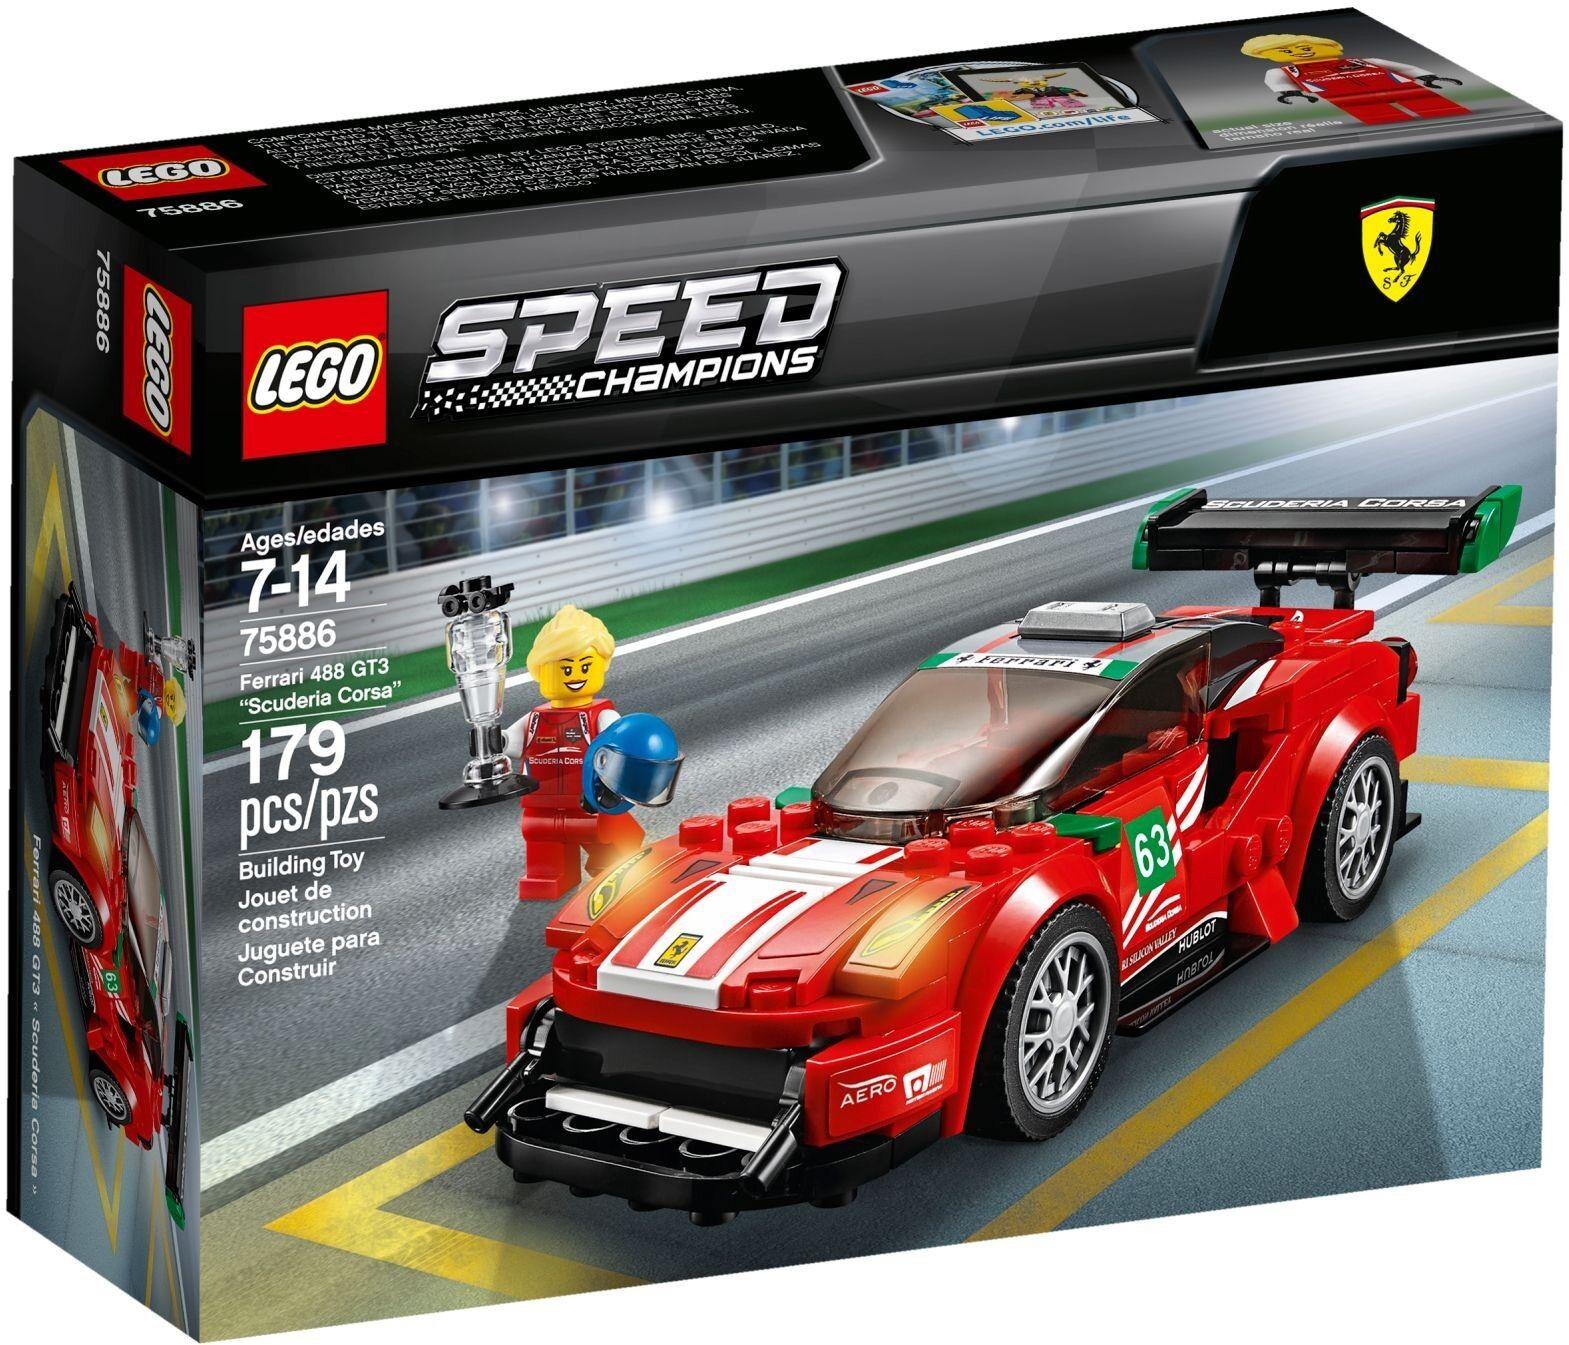 Lego 75886 - Speed Champions - Ferrari 488 GT3 Scuderia Corsa - Sealed - New 1